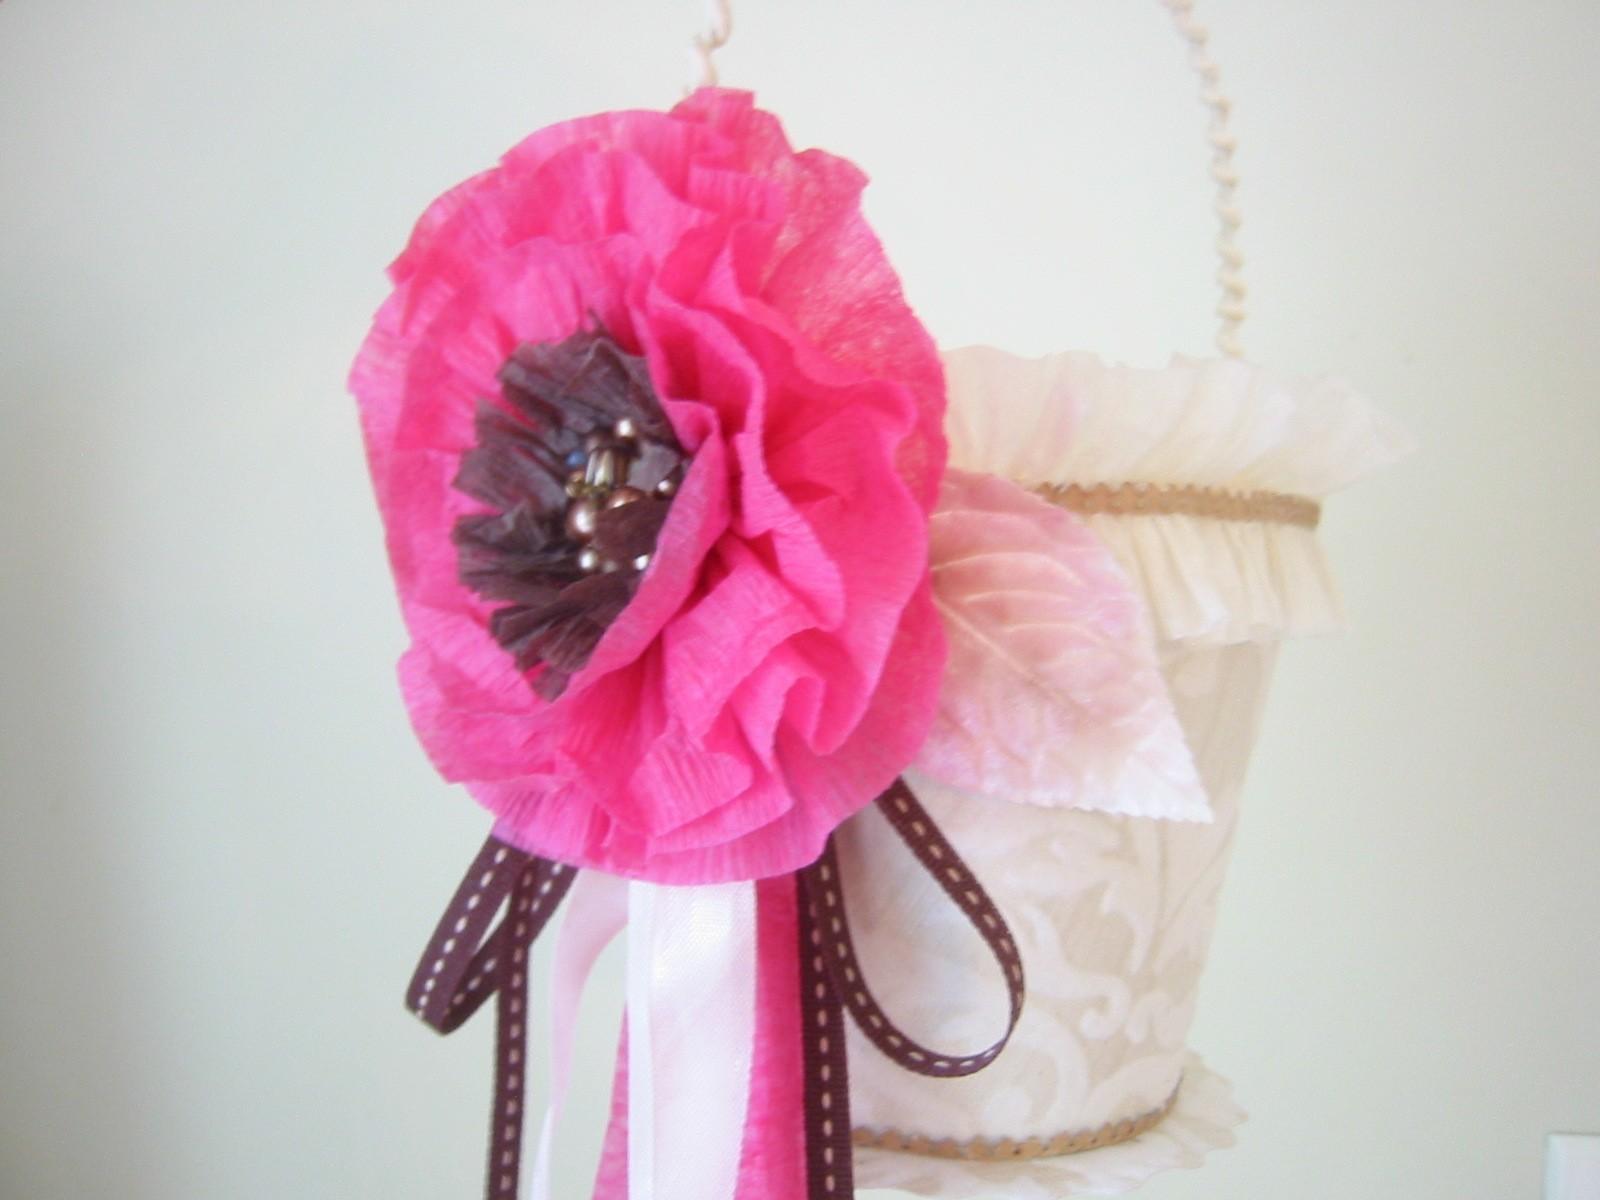 Flowers & Decor, ivory, pink, brown, Flower, Girl, Custom, Champagne, Basket, Bucket